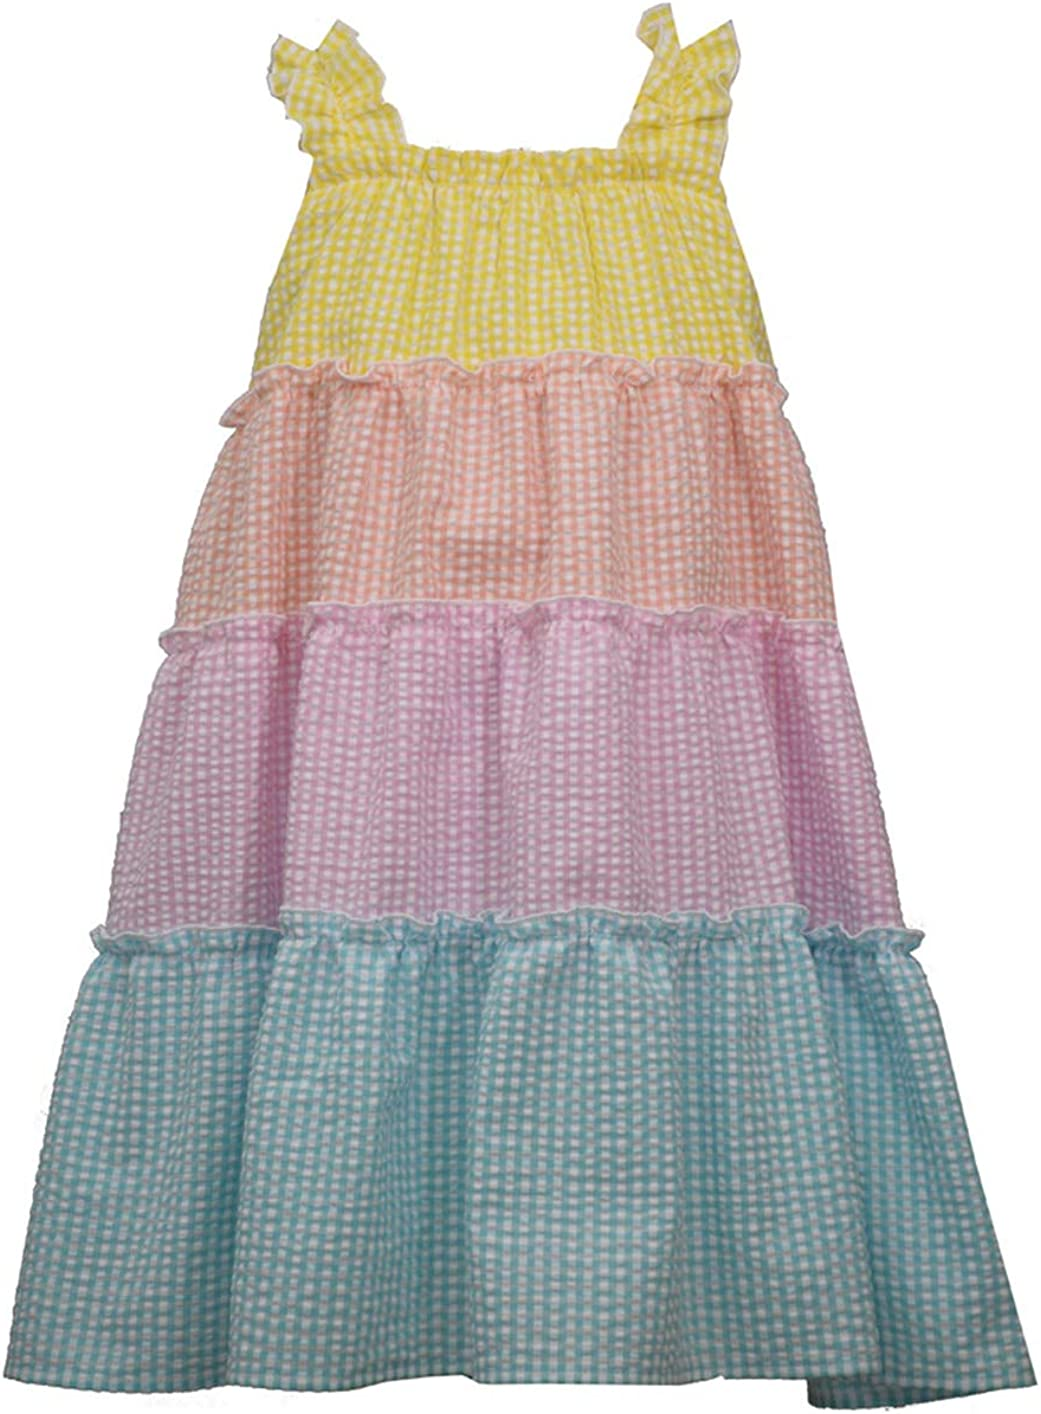 Bonnie Jean Dress - Rainbow Seersucker Dress for Toddler and Little Girls